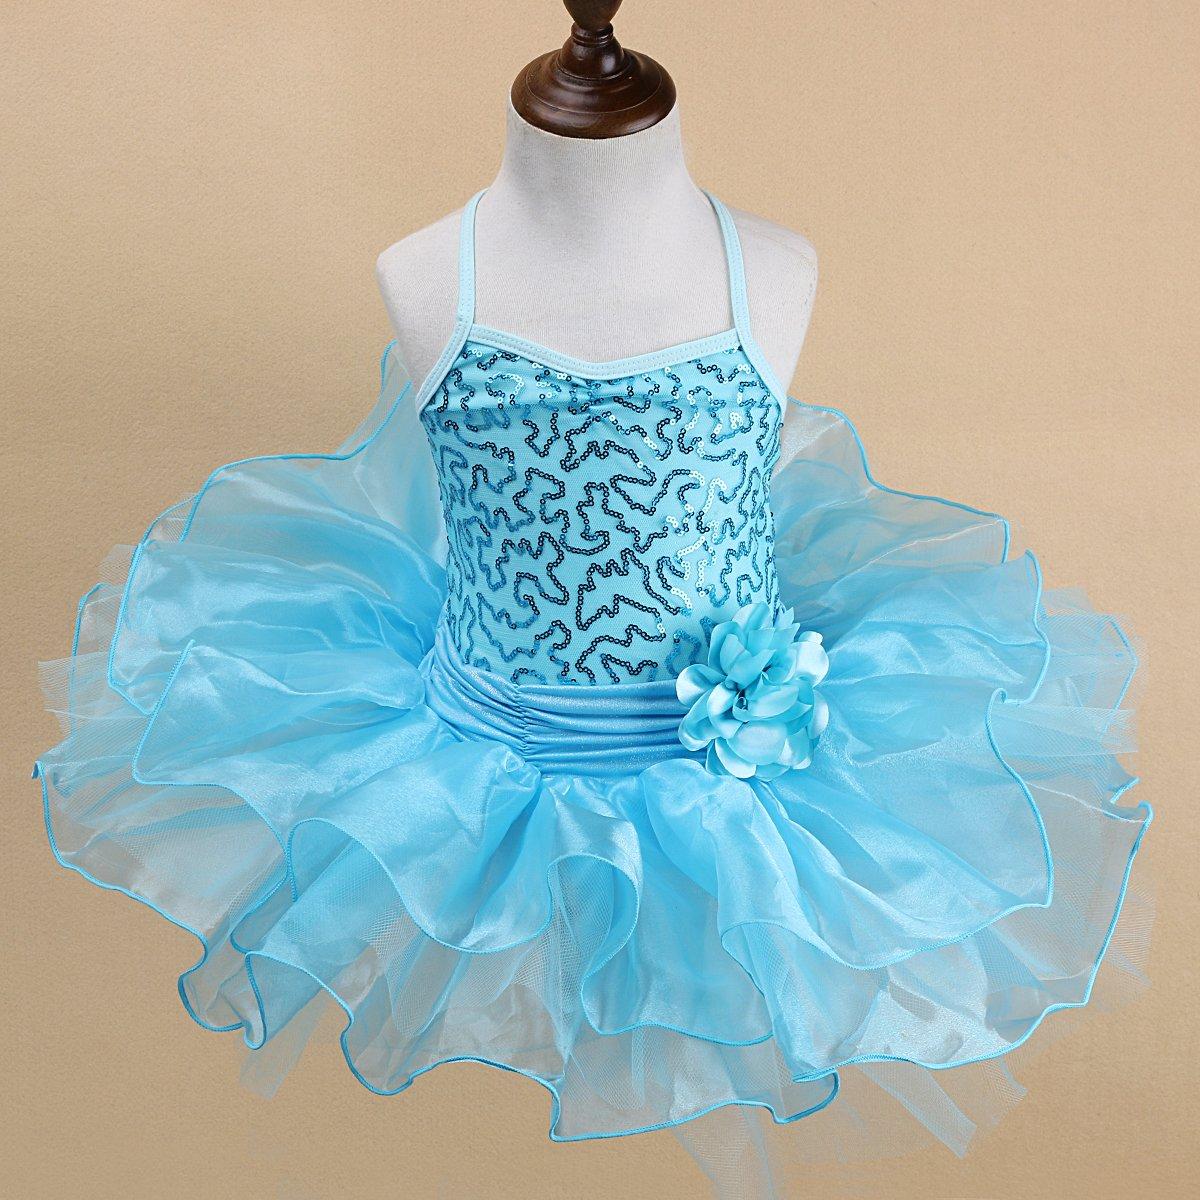 352229c76 Amazon.com  Little Girls  Ballet Sequined Dress Gymnastics Dance ...